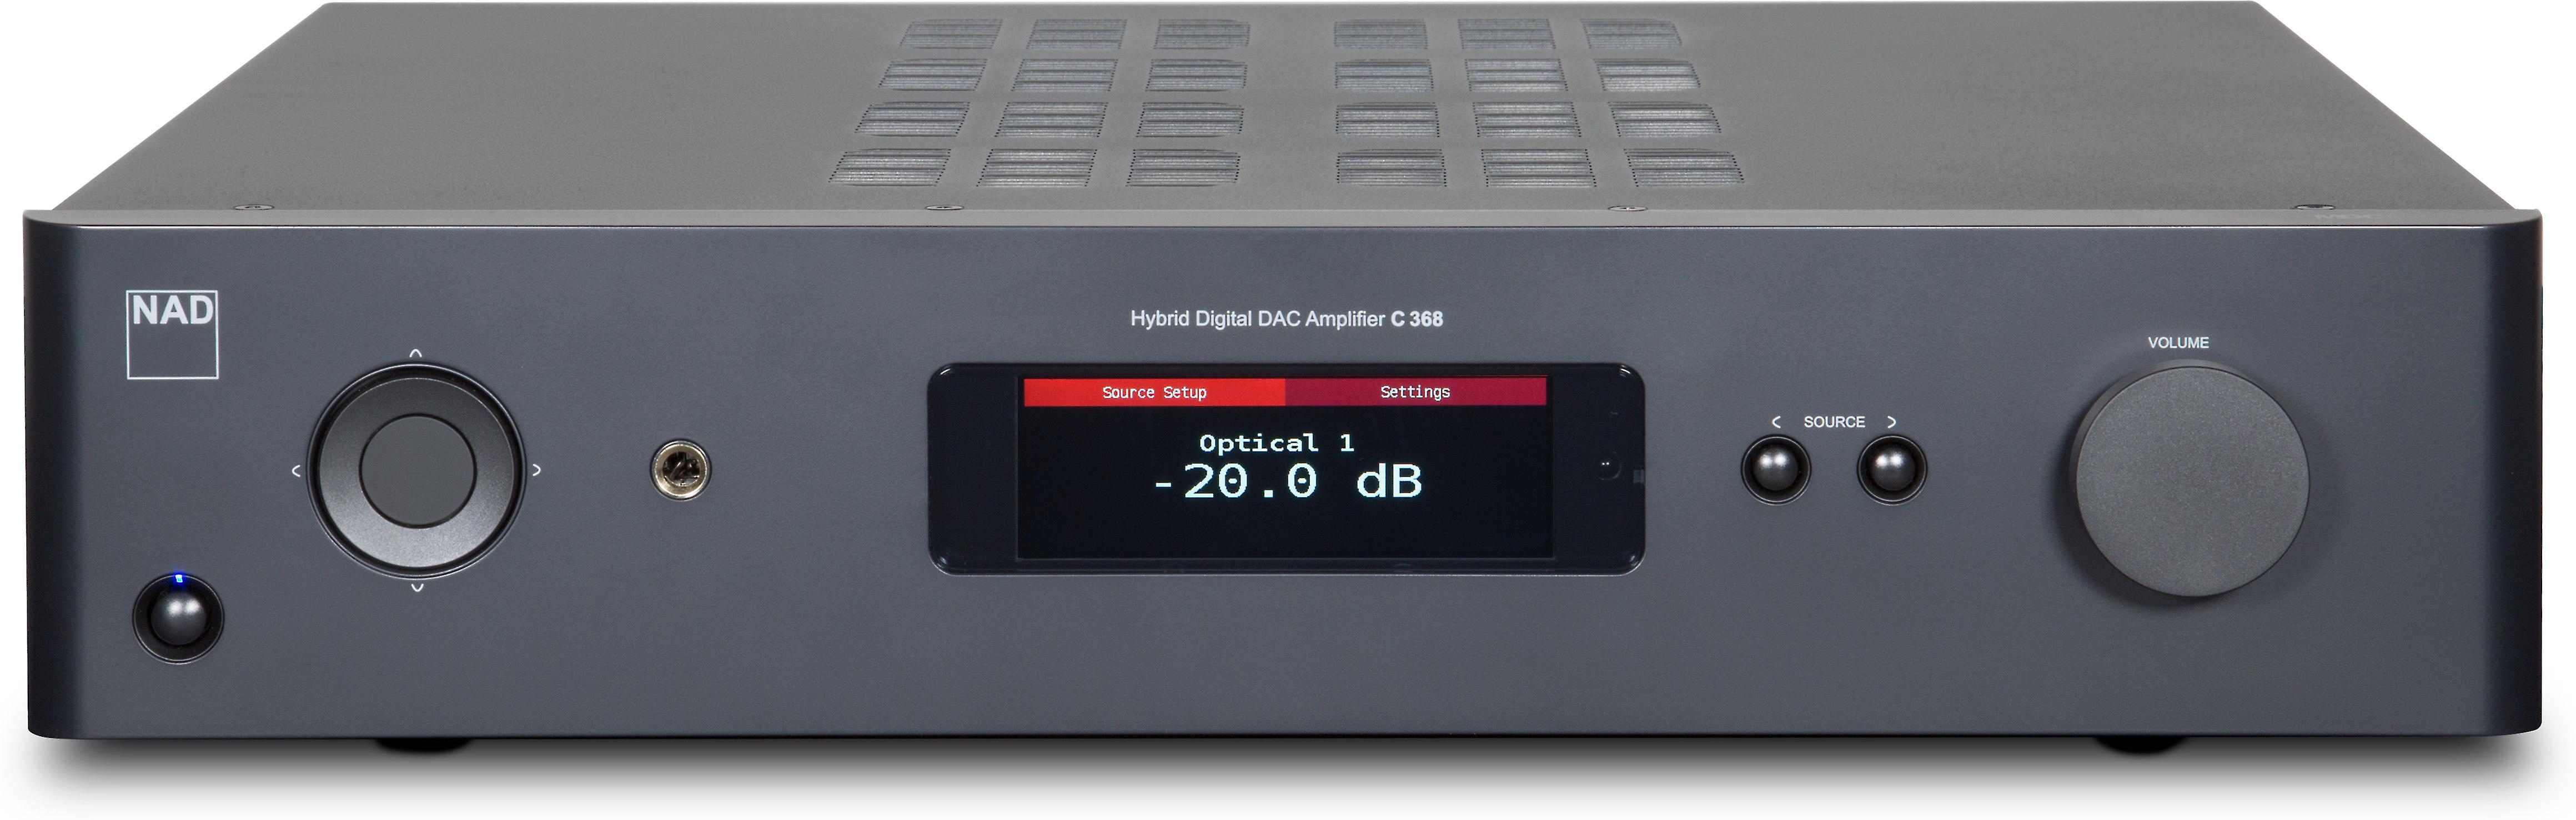 NAD C 368